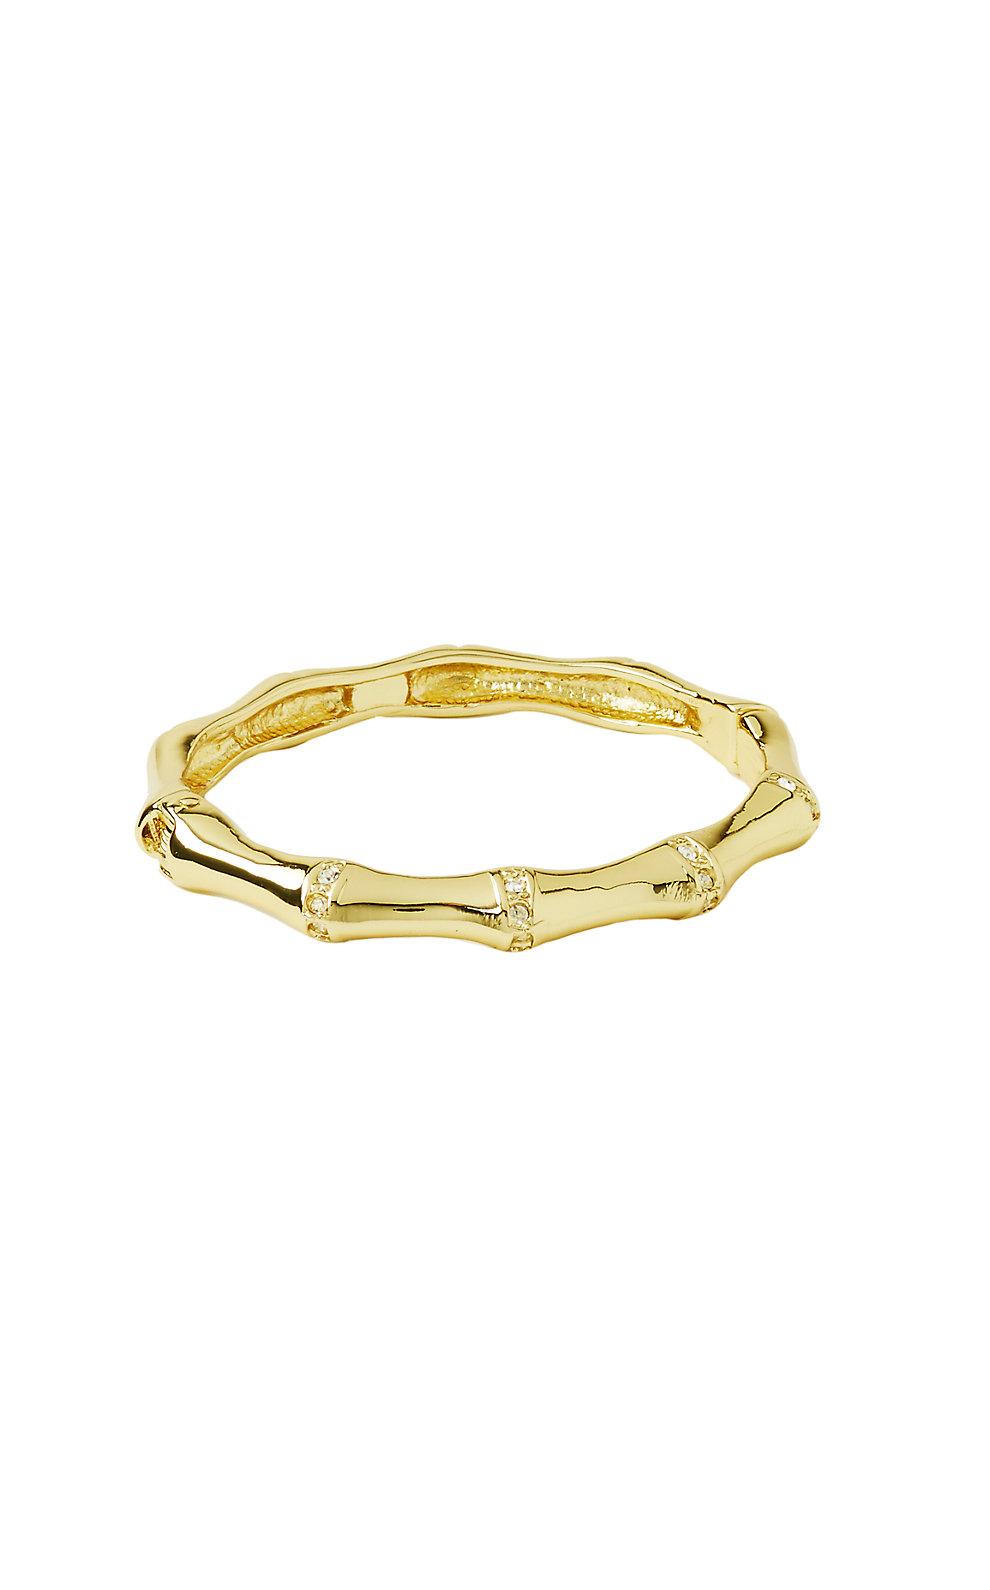 Lilly Pulitzer Bambu Bracelet